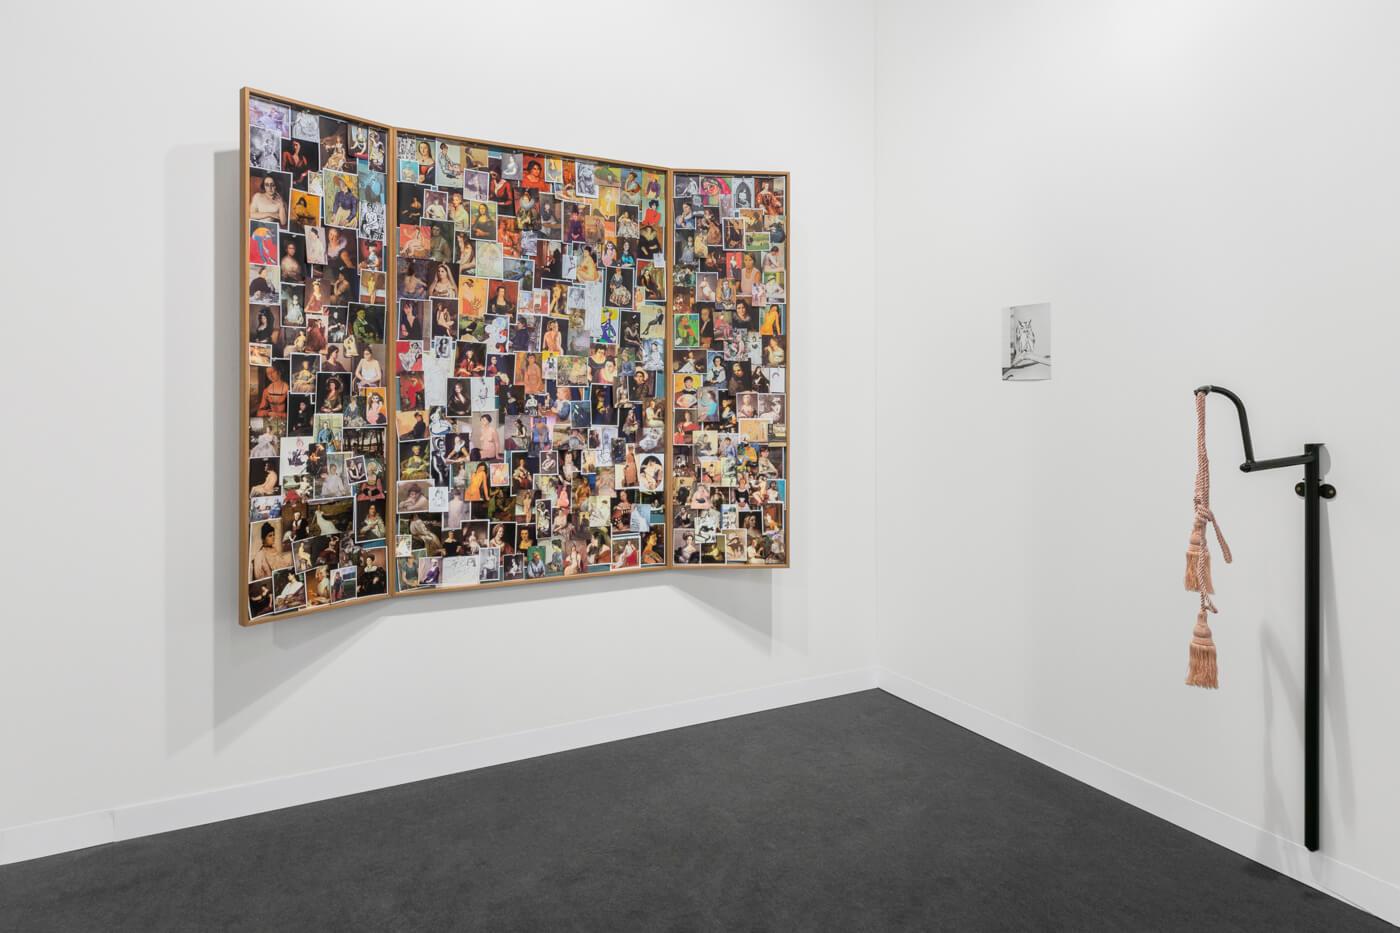 Installation view: ProjecteSD, Hall 2.1, Booth L4 | ART BASEL 2019 | ProjecteSD